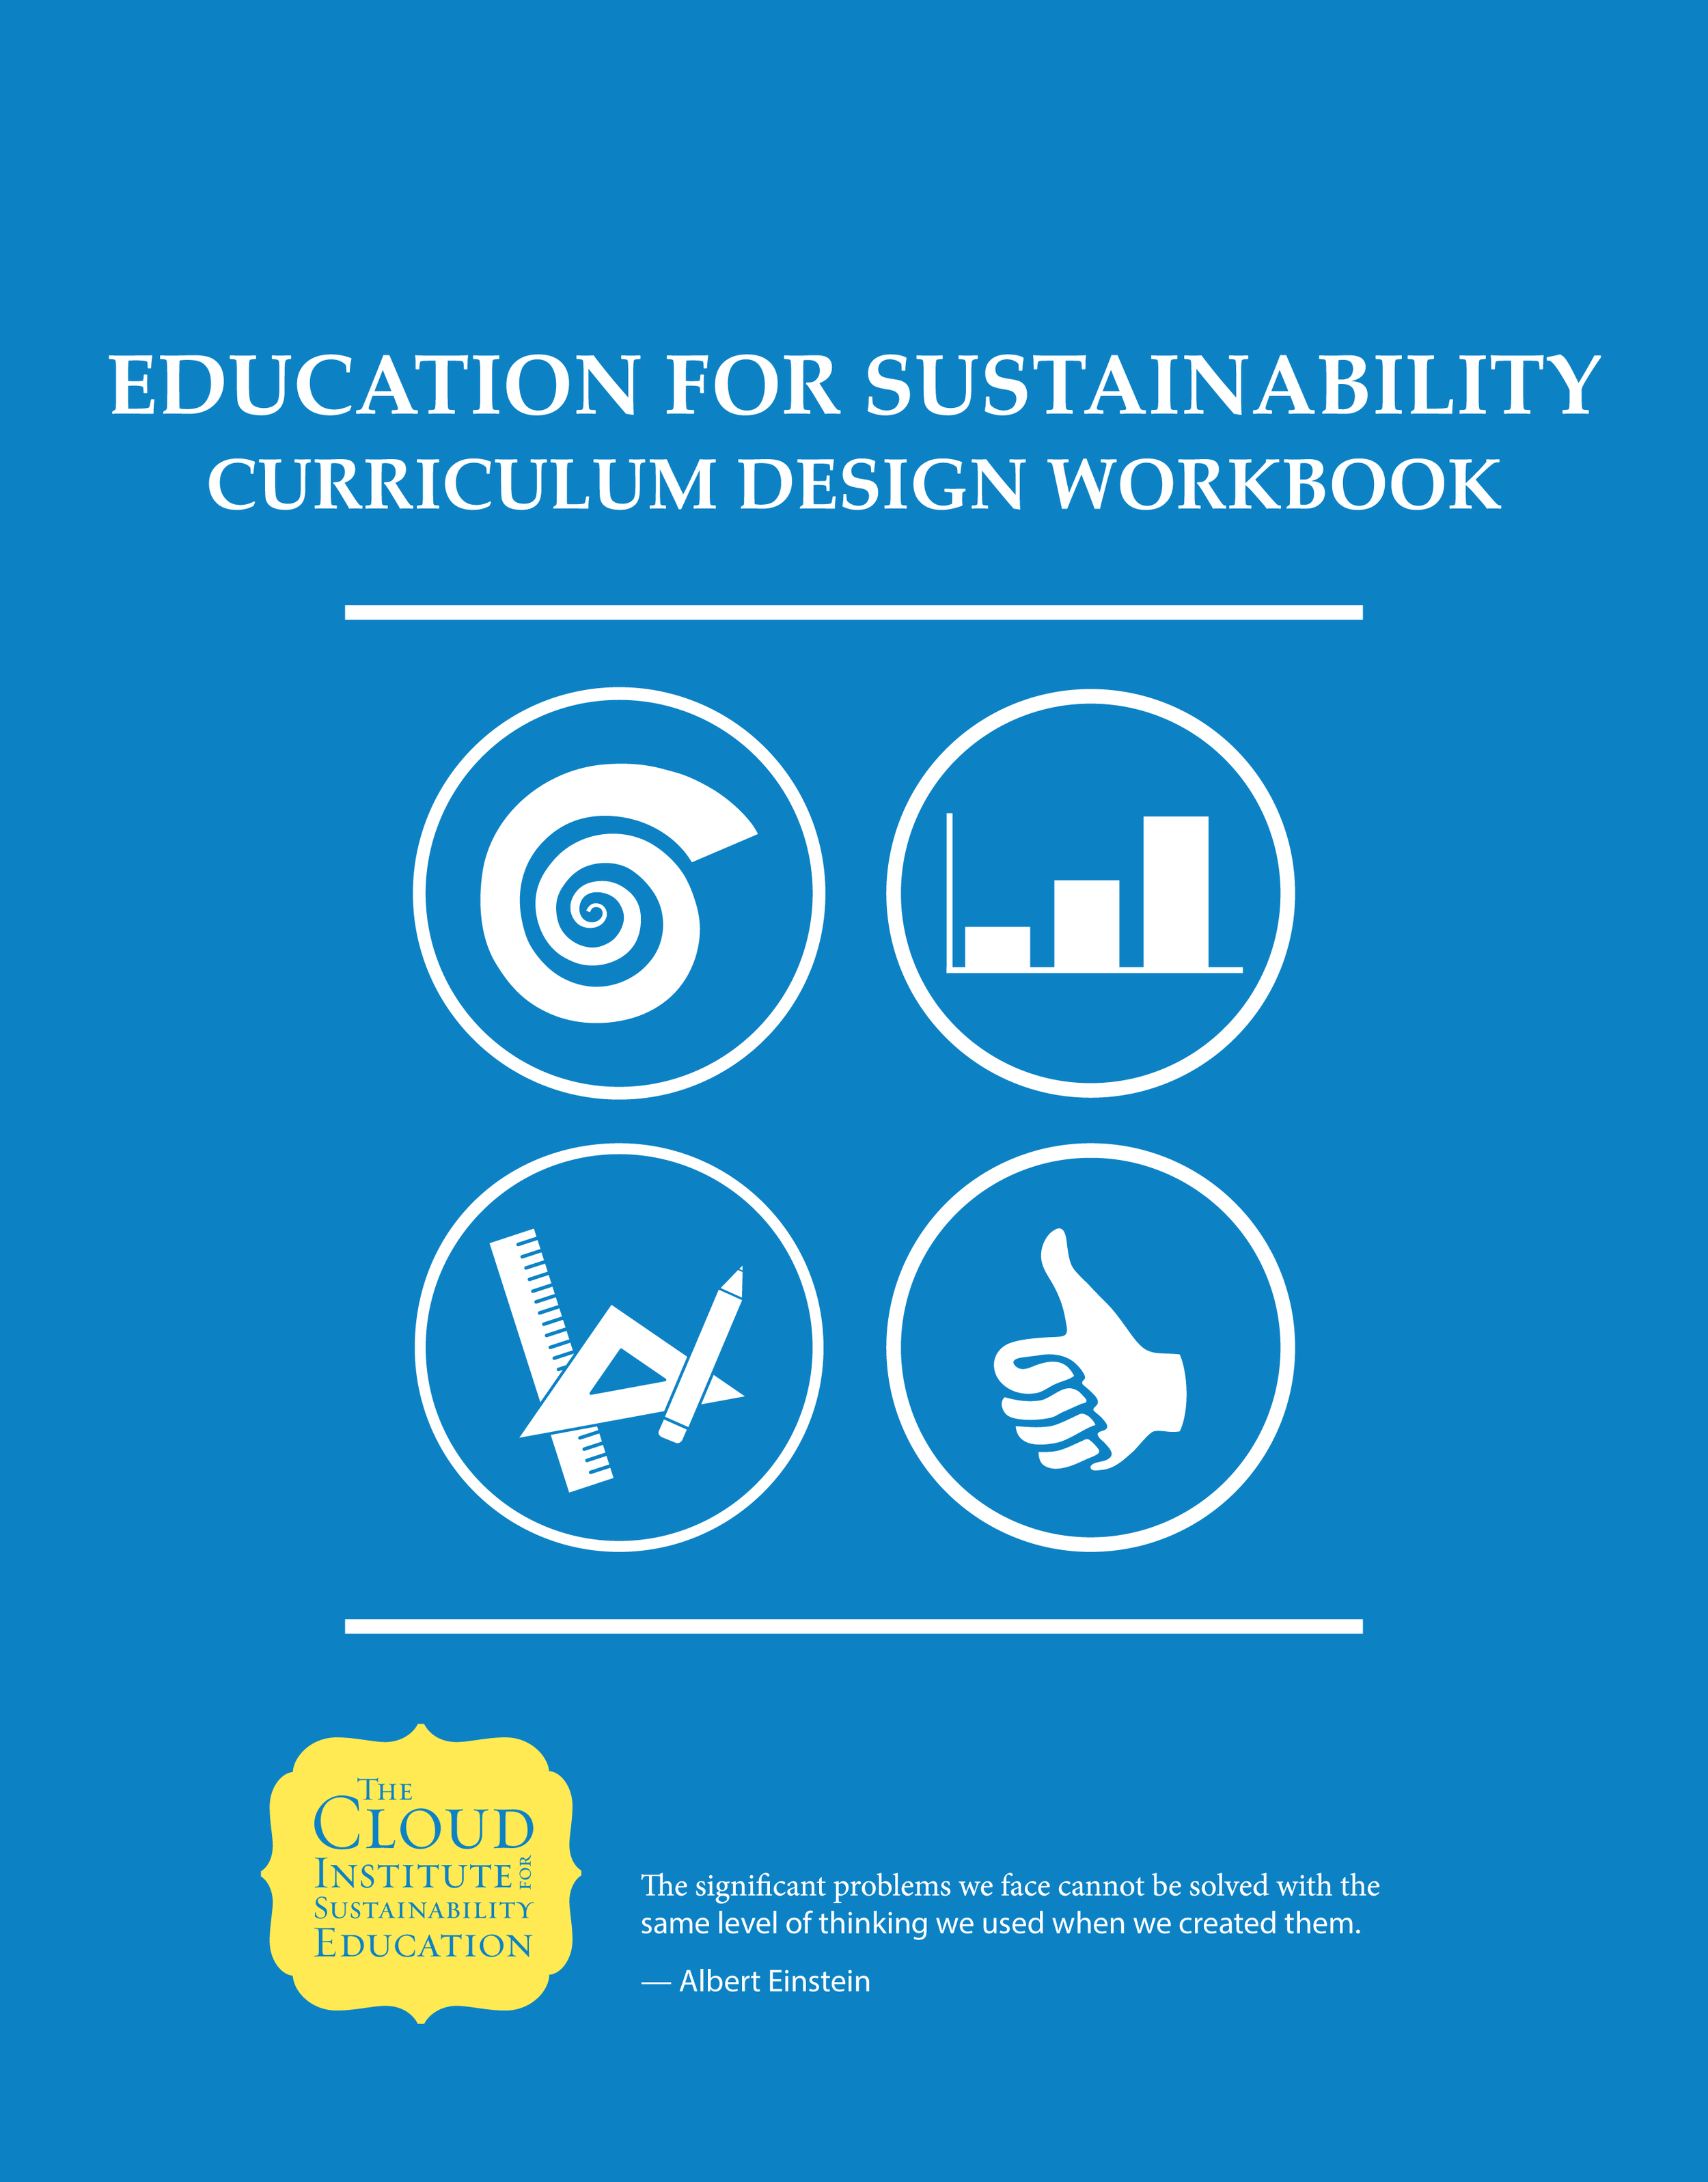 EfS Curriculum Design Workbook 2016.png